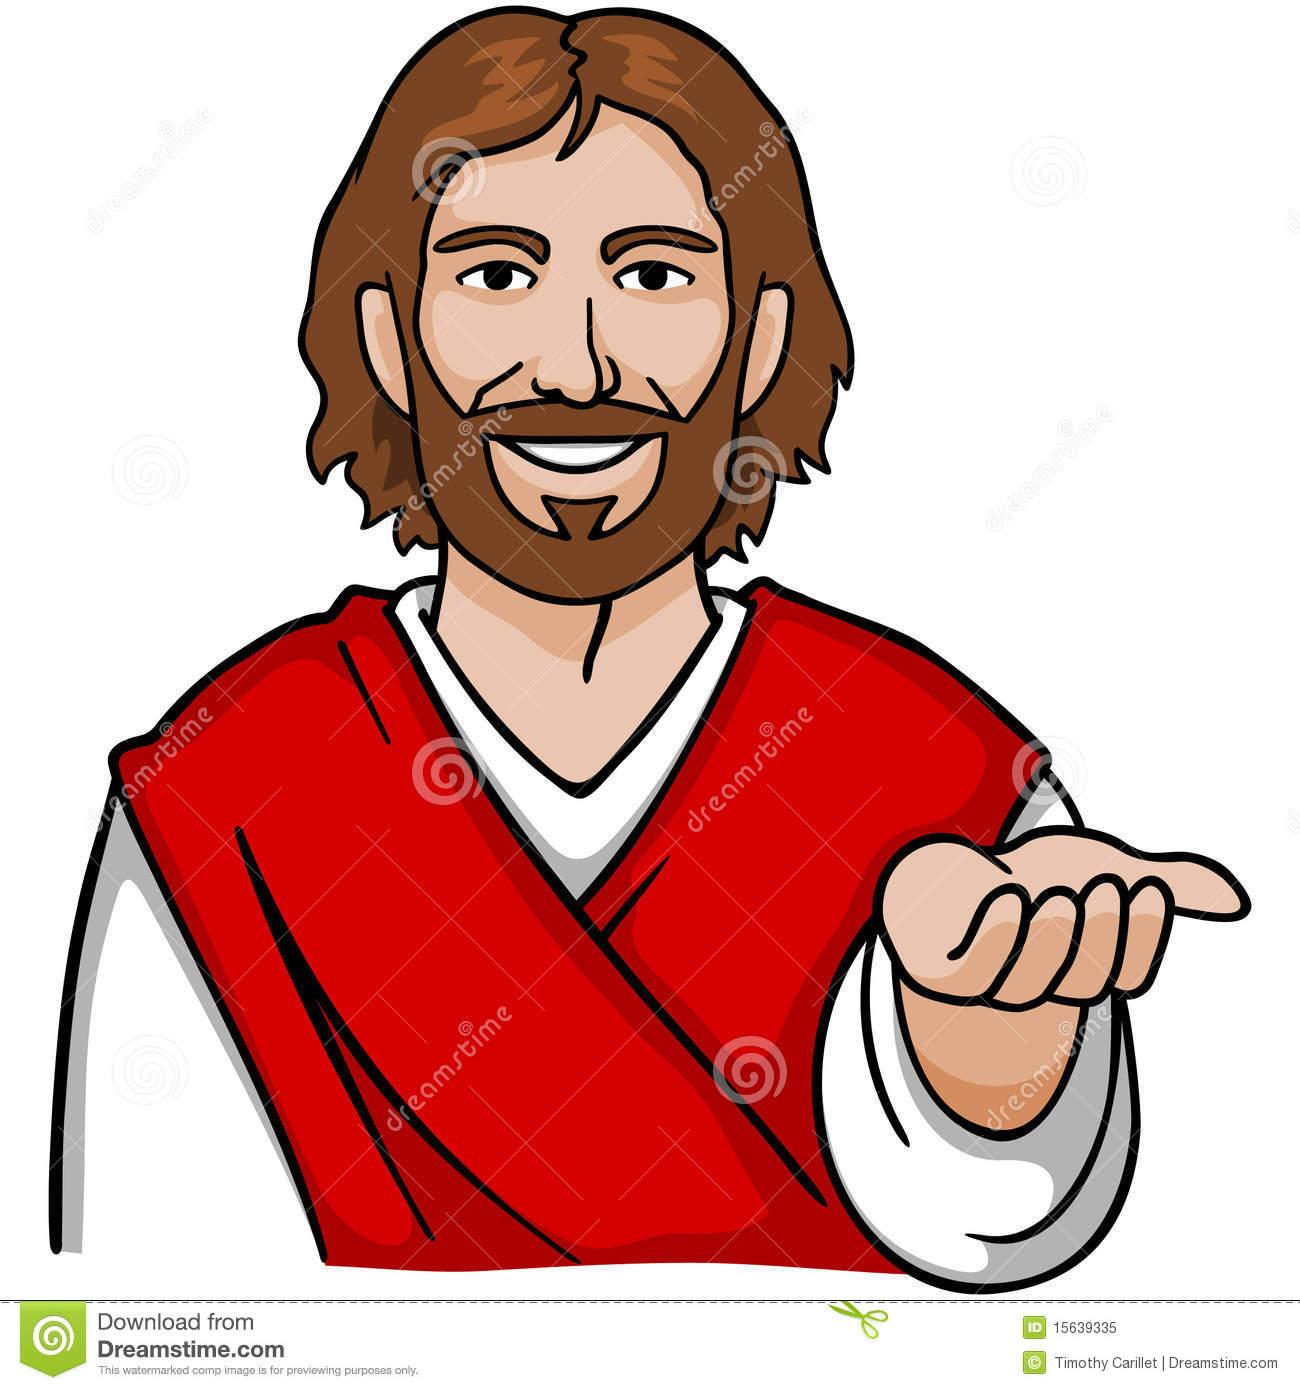 Jesus Clipart Free.